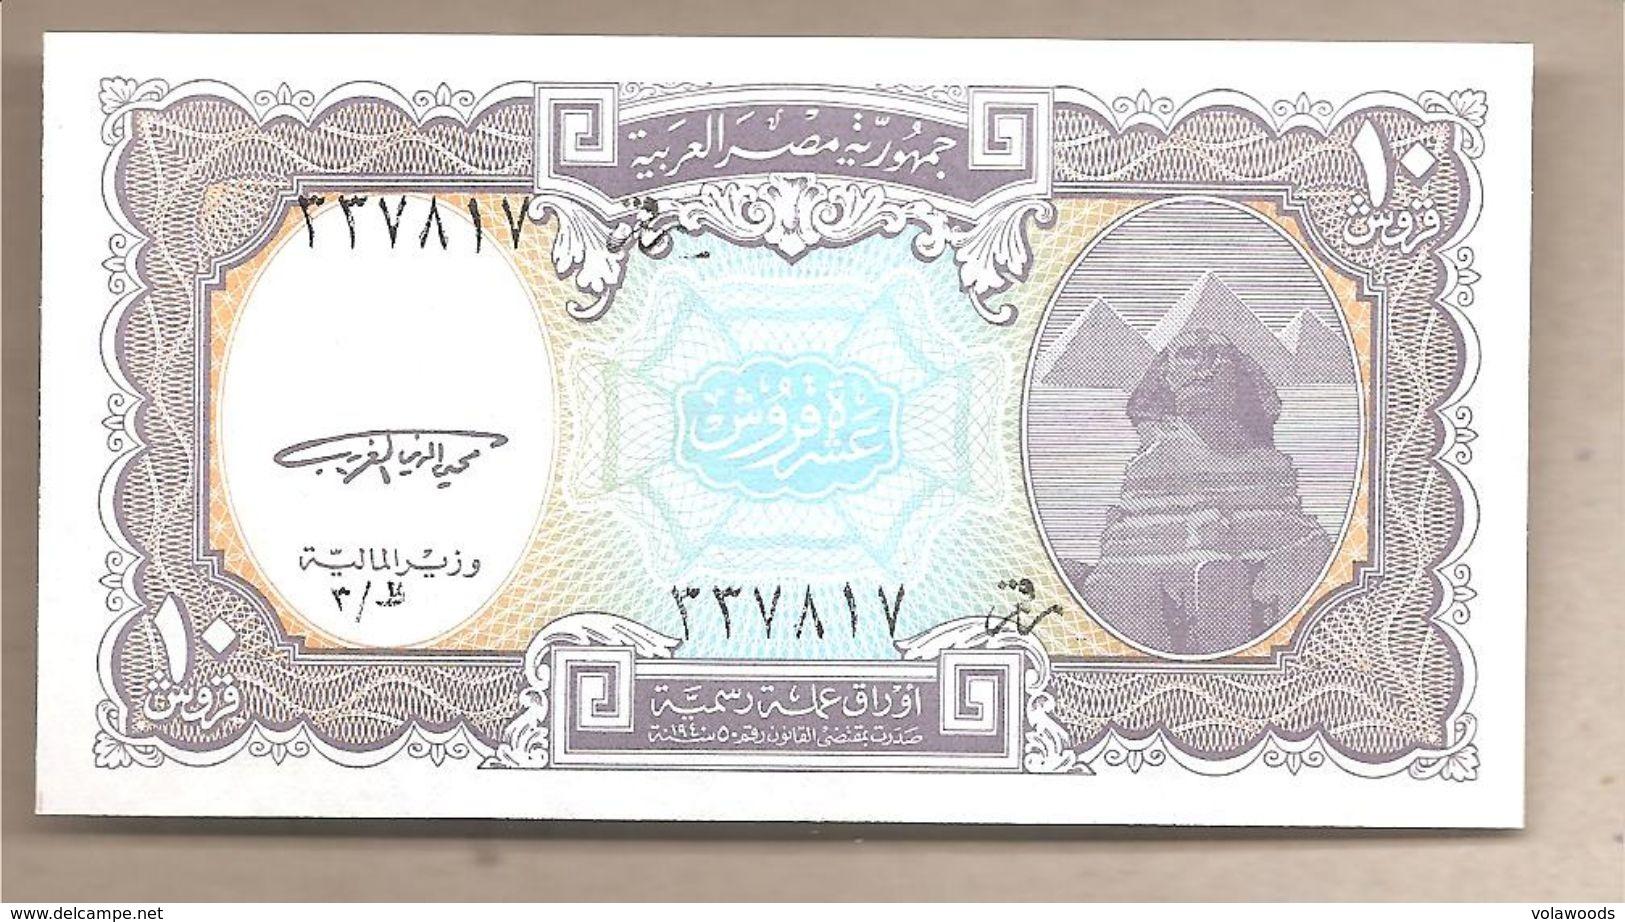 Egitto - Banconota Non Circolata FdS Da 10 Piastre P-189a - 1998 - Egypt